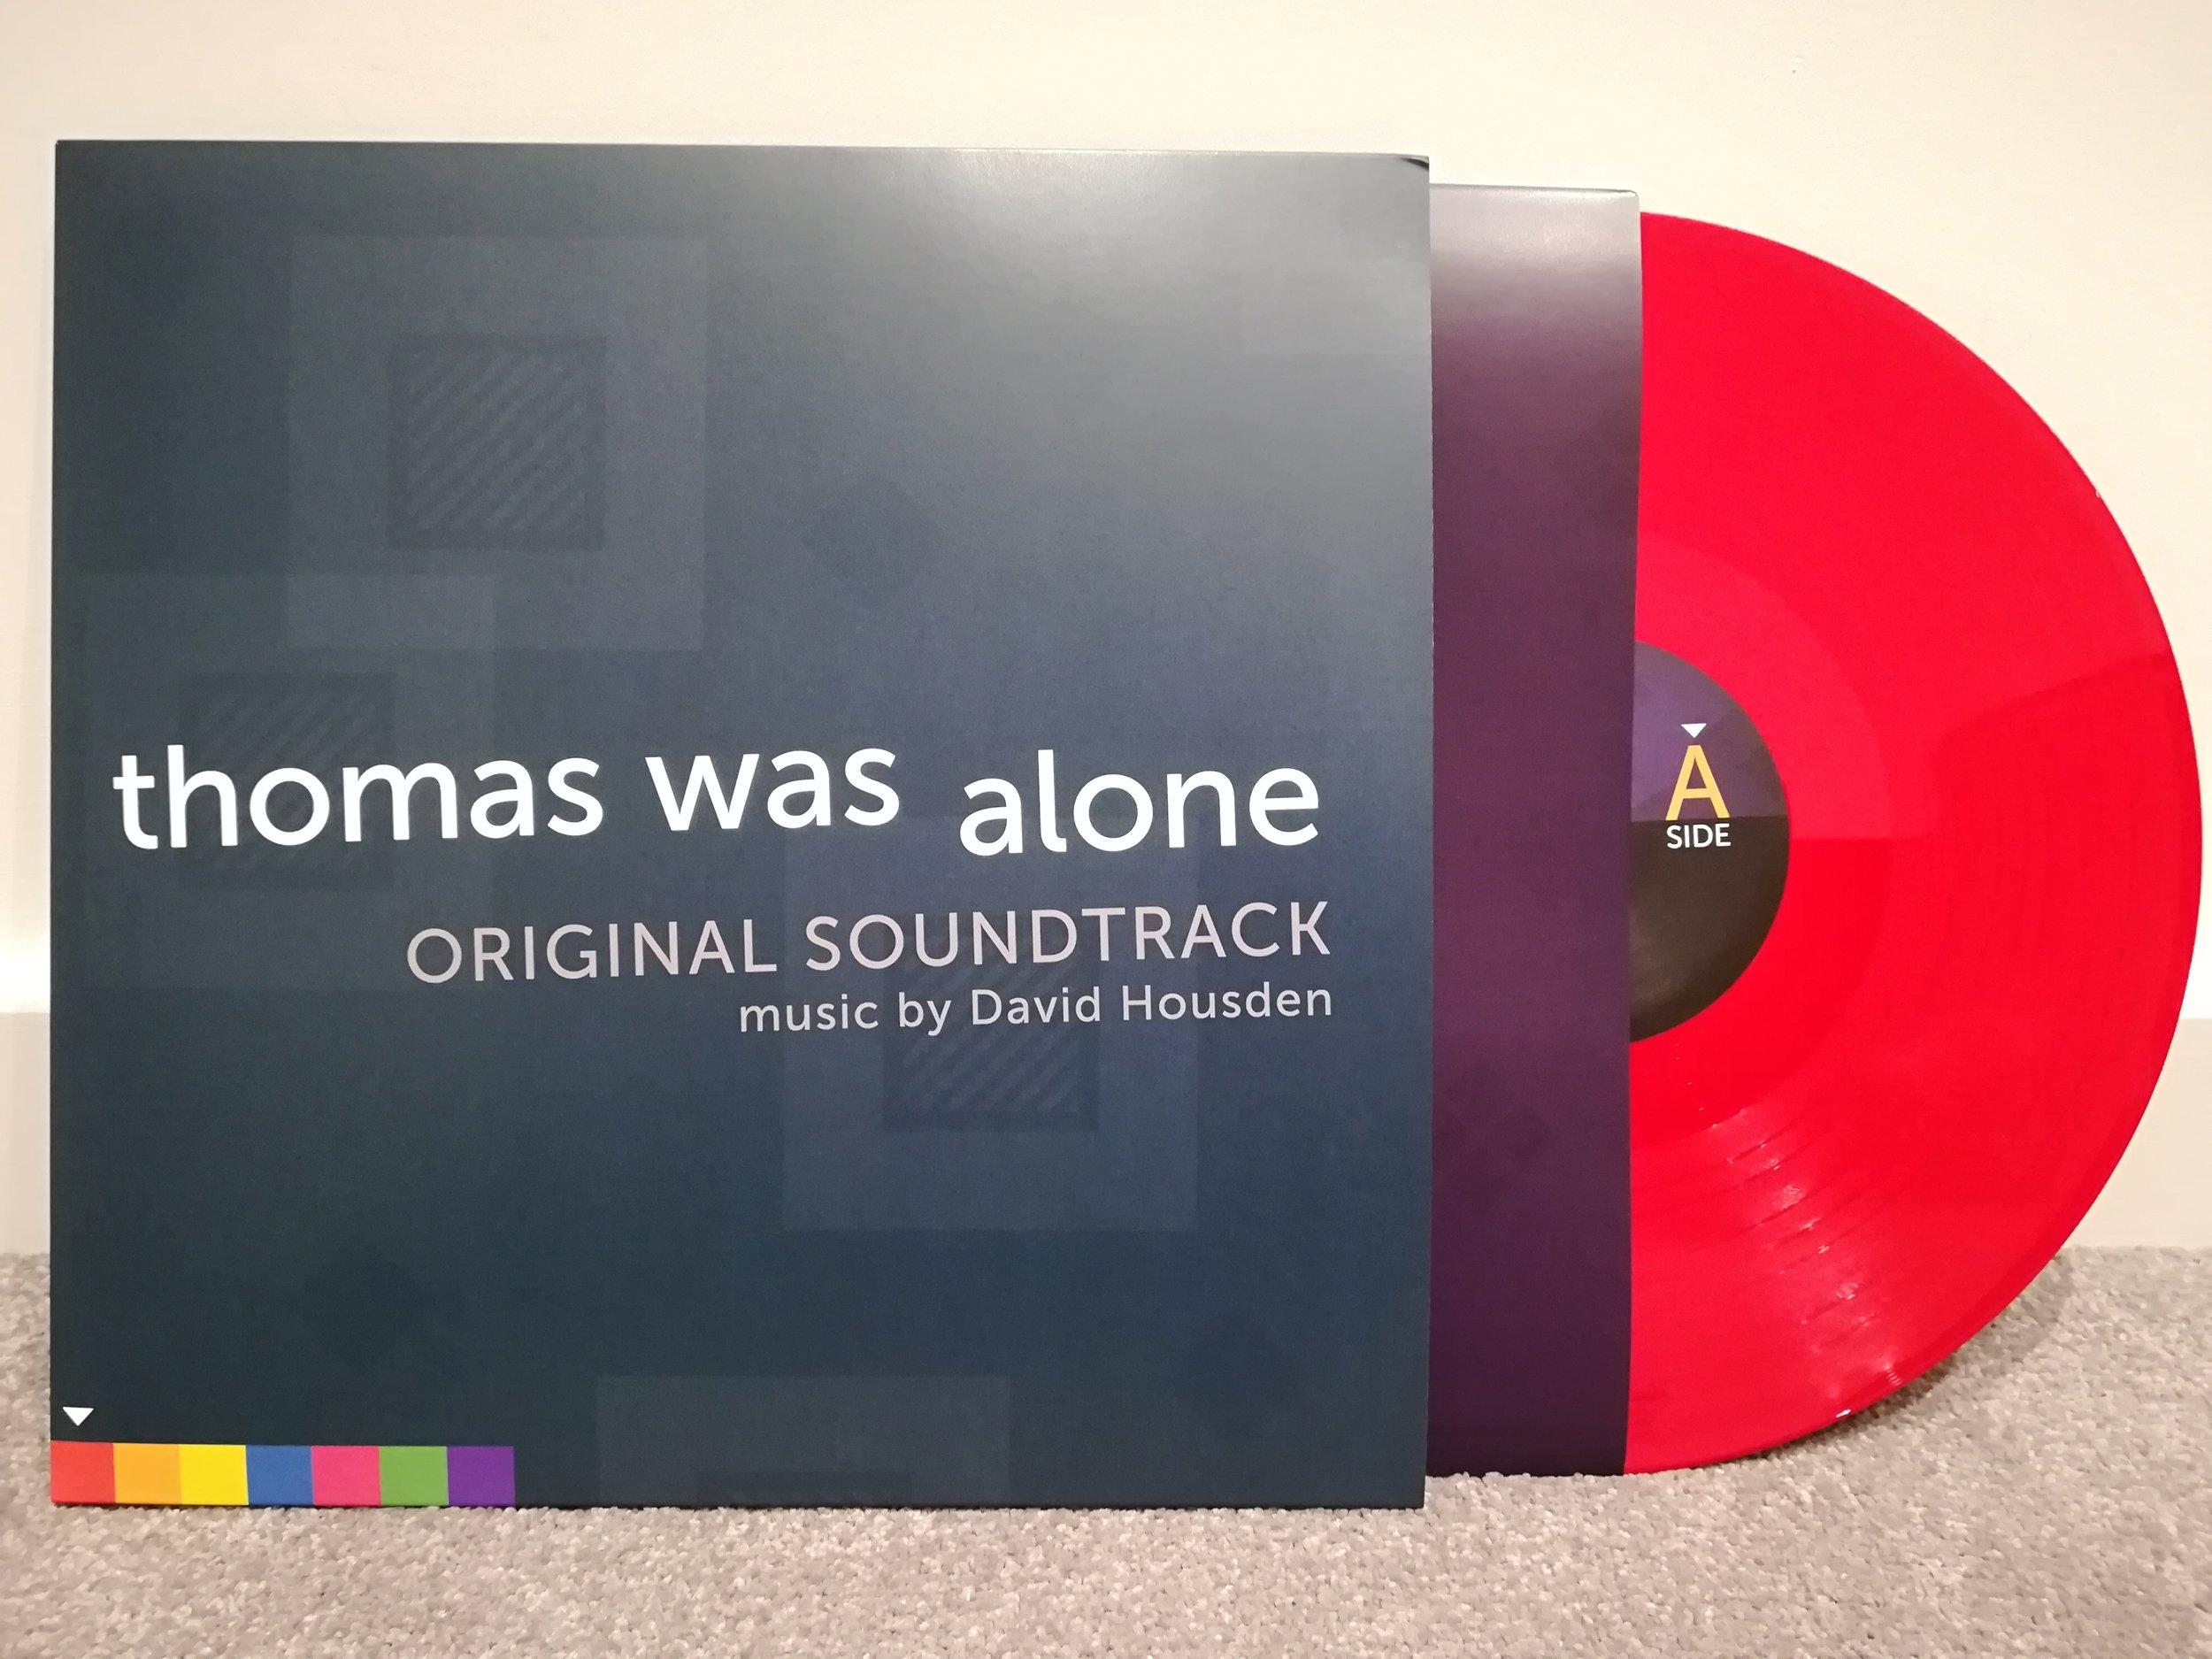 Thomas Was Alone Vinyl Soundtrack